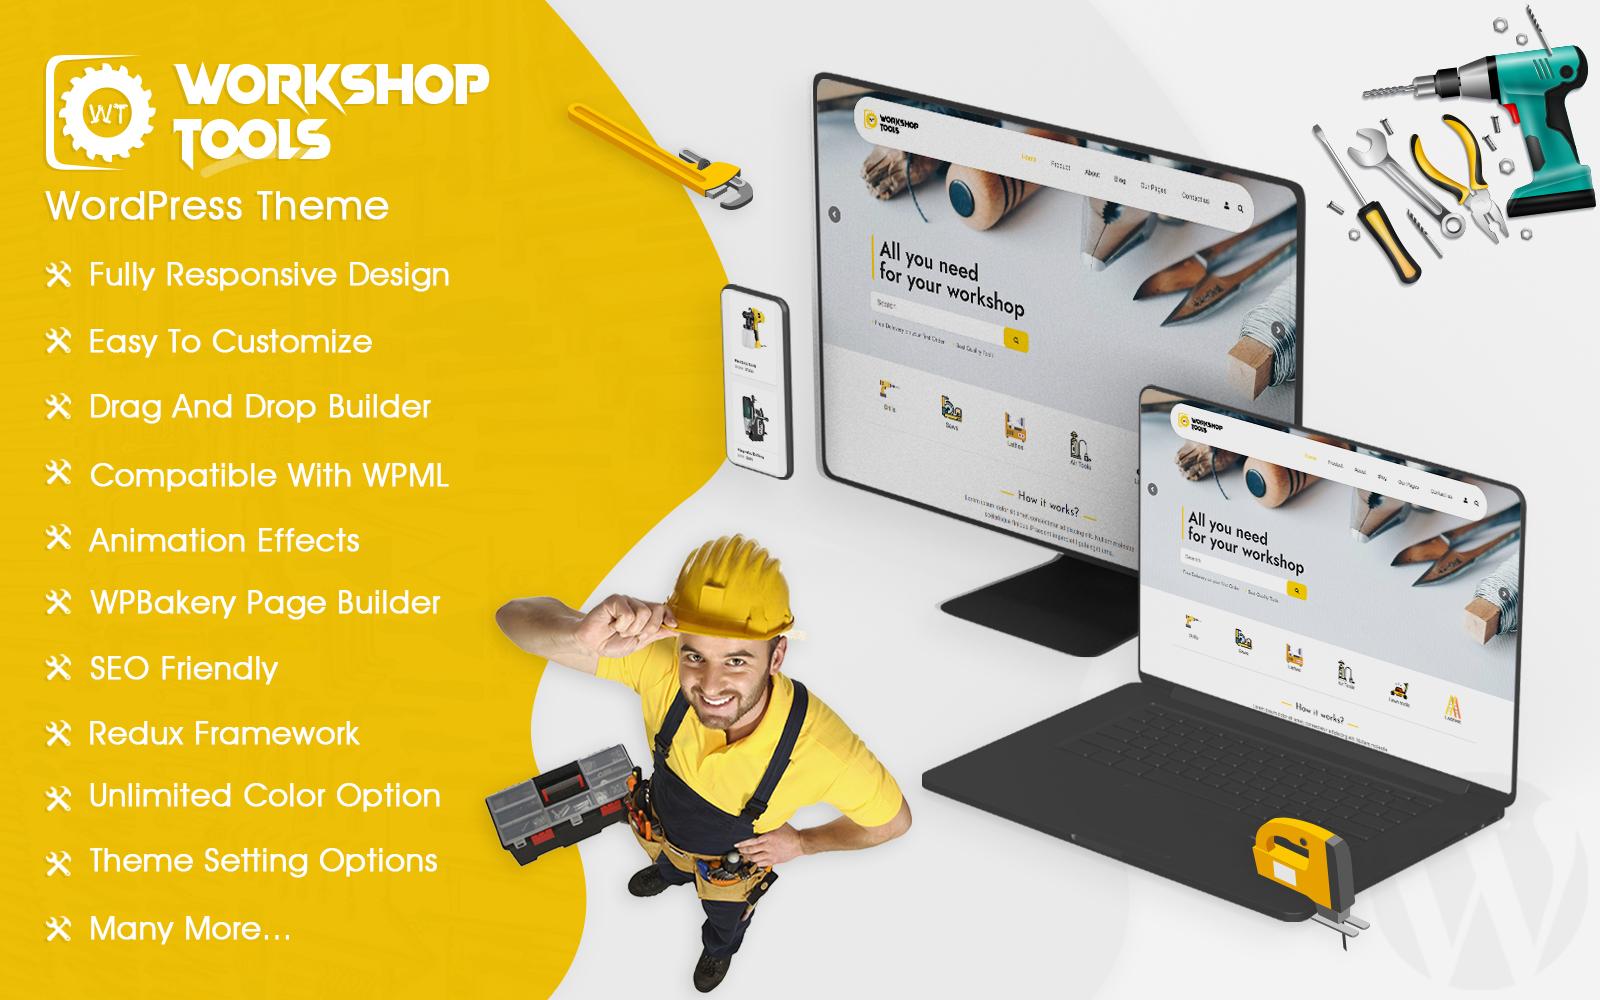 Workshop Tools Store WooCommerce Theme